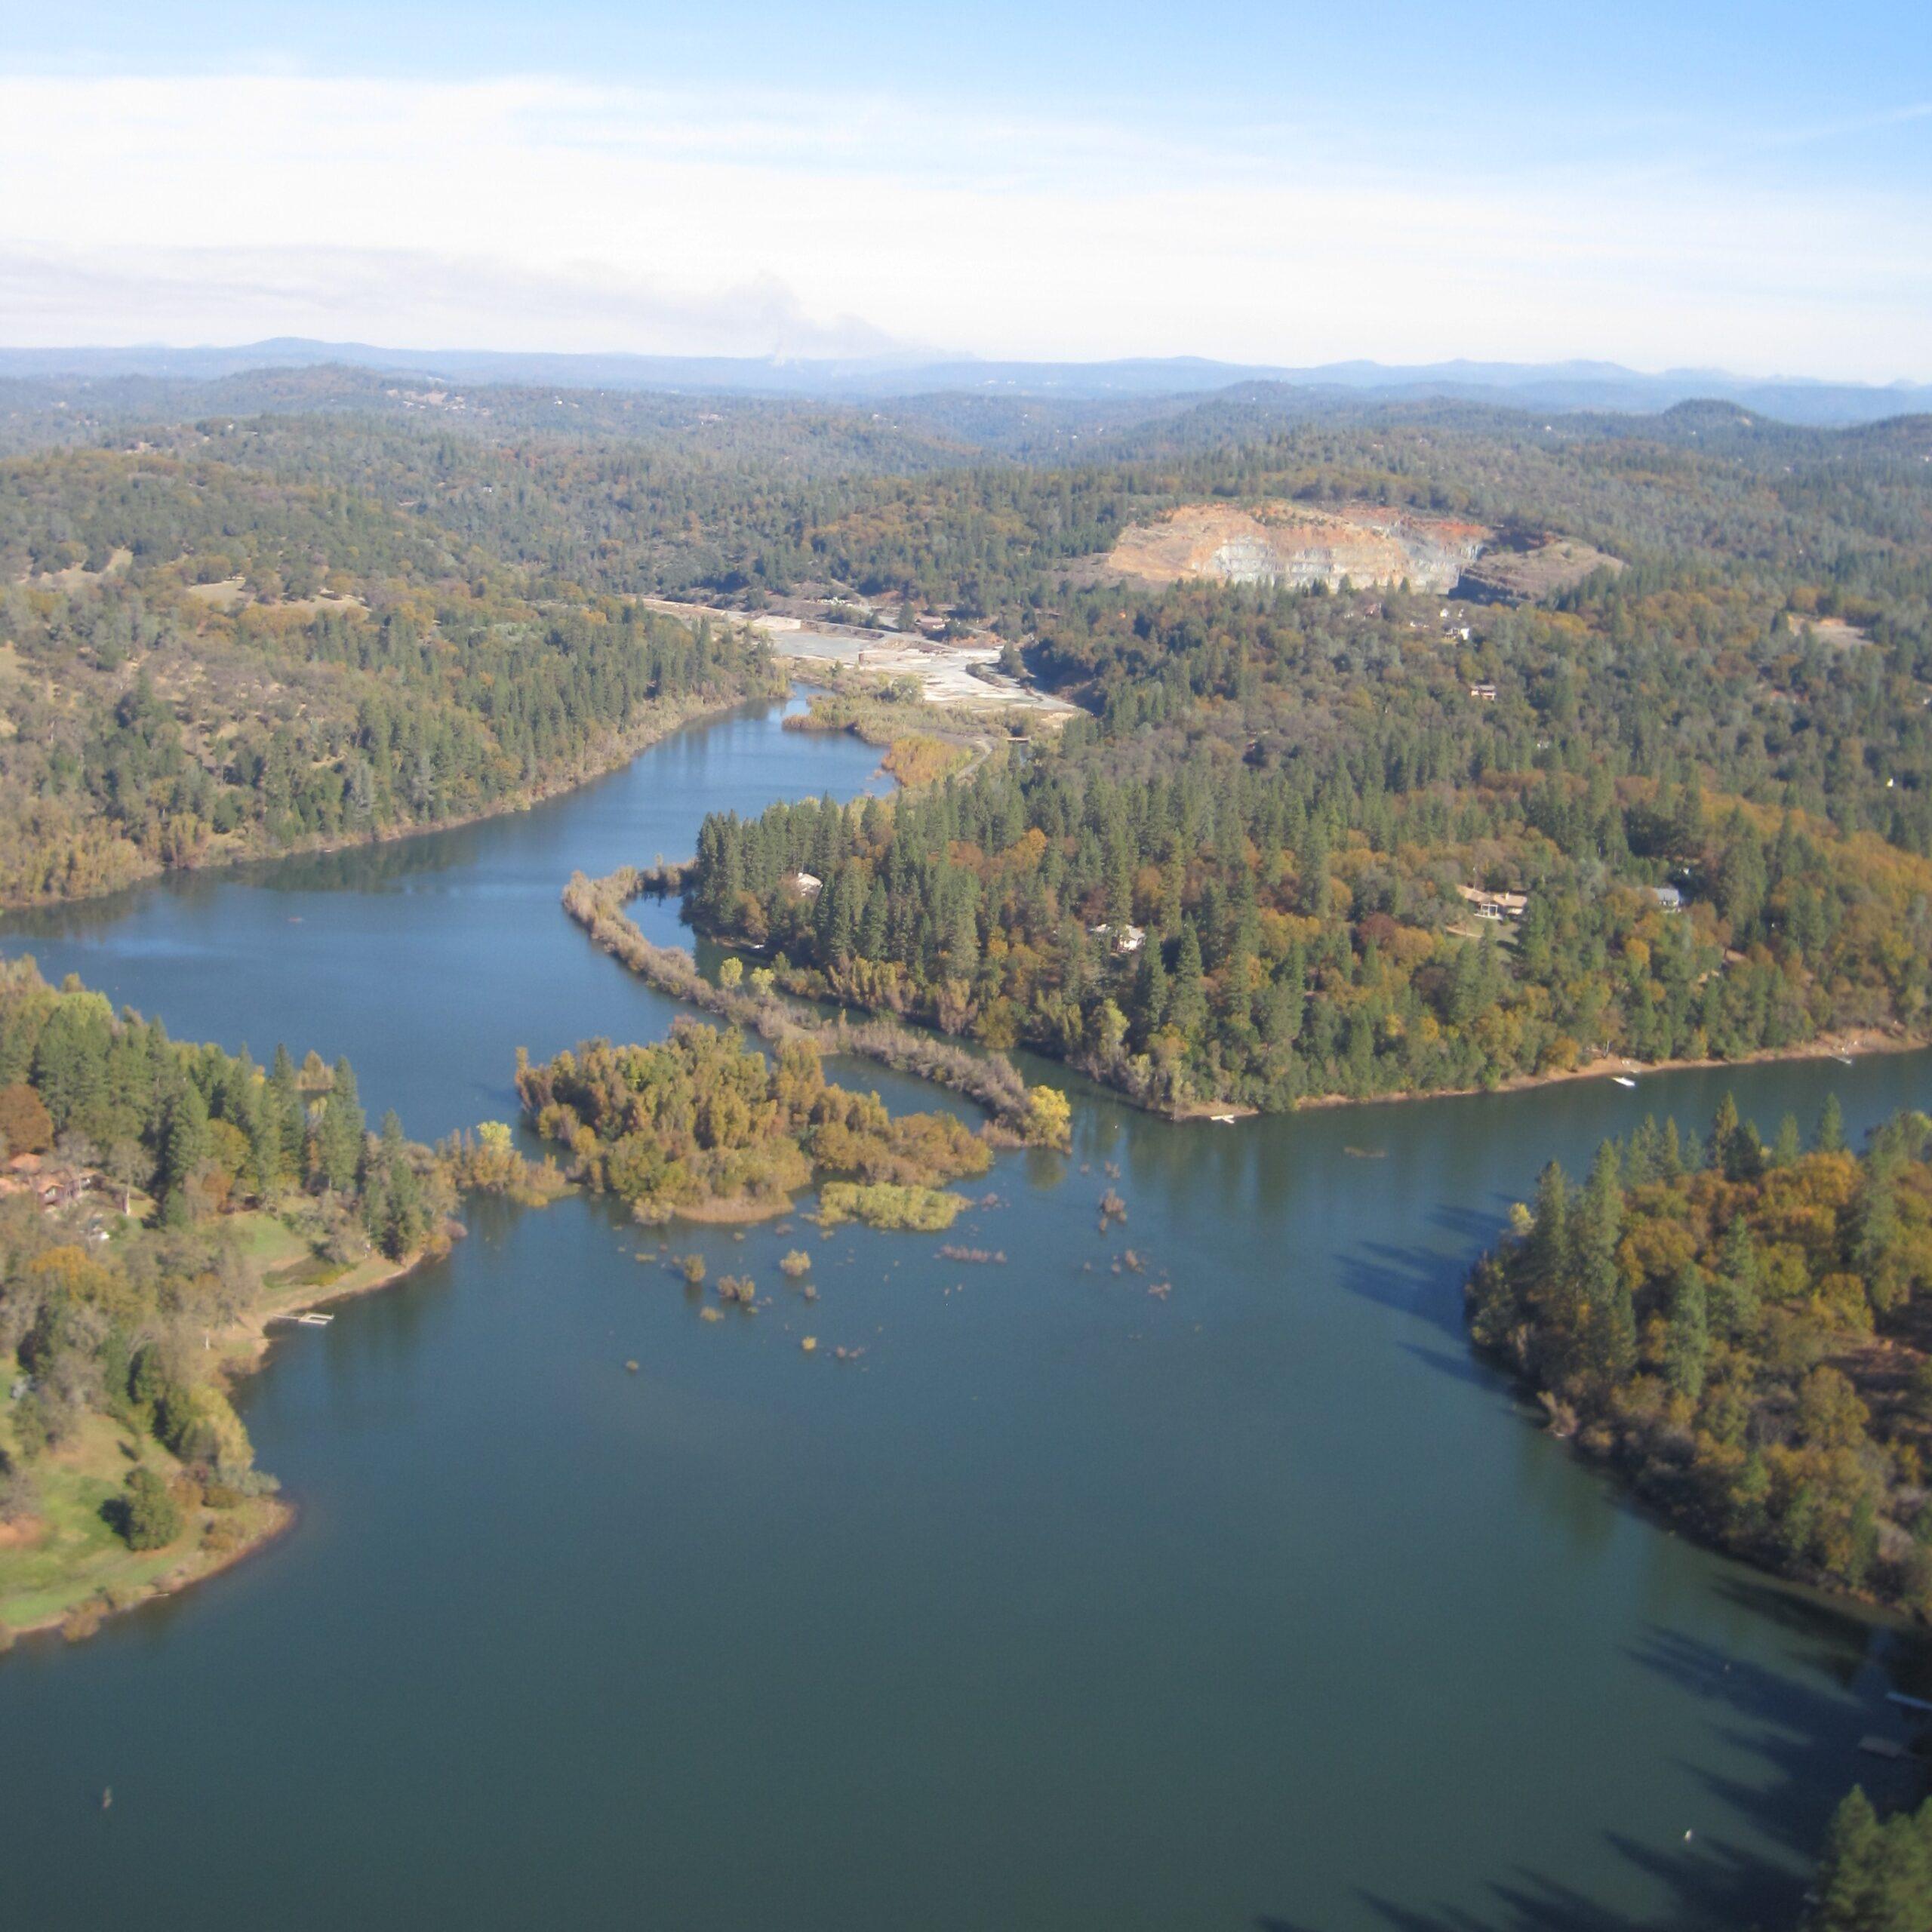 aerial view of Combie reservoir